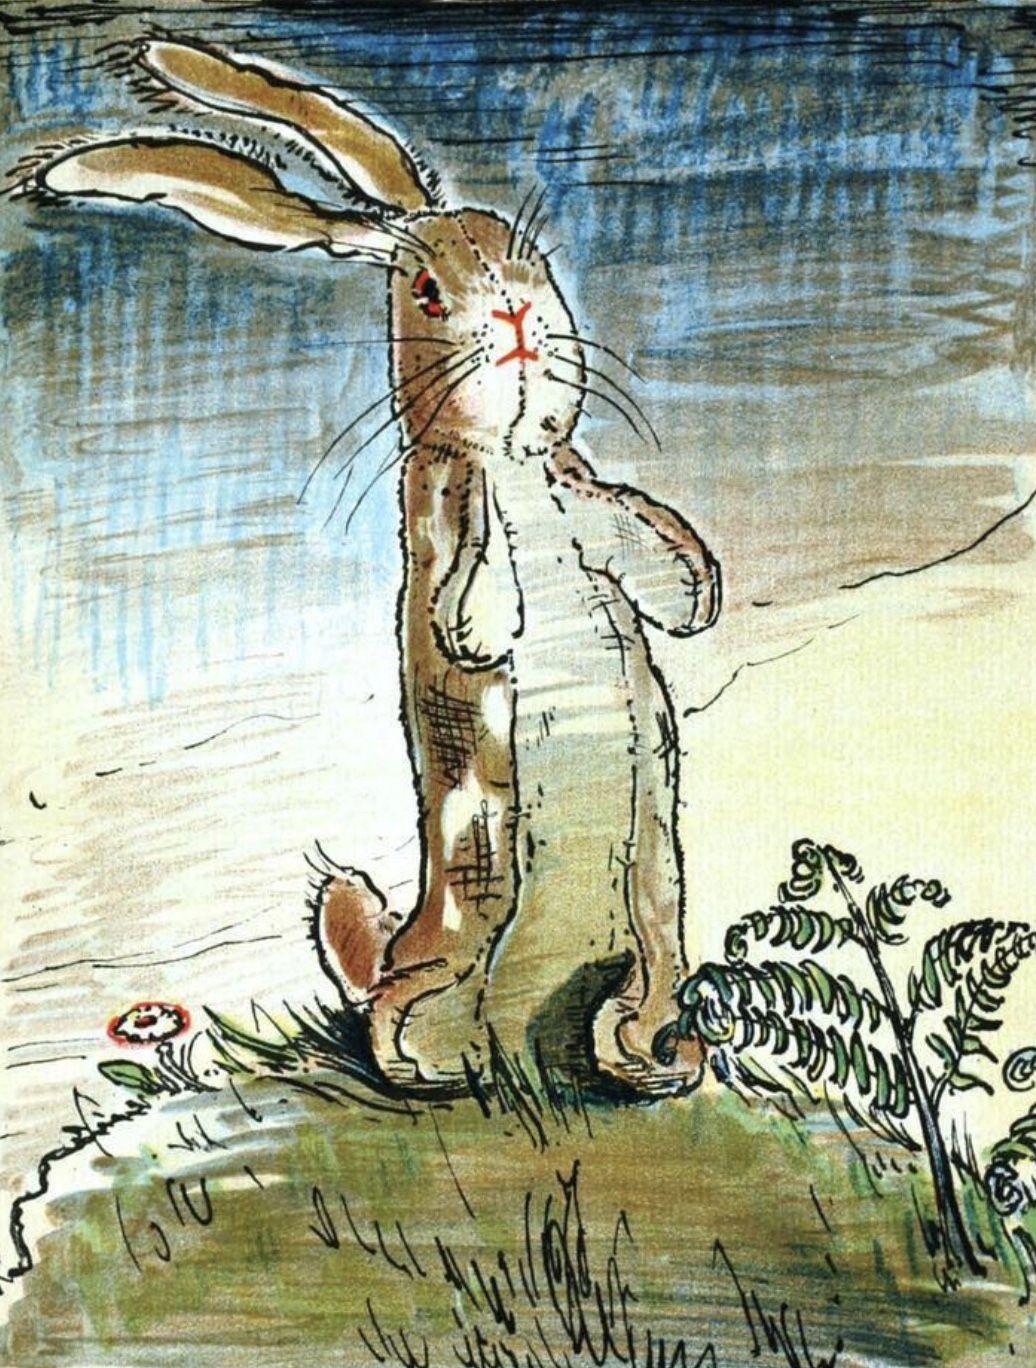 Pin by shelley n on Good Grief in 2020   Velveteen rabbit, Art, Instant art